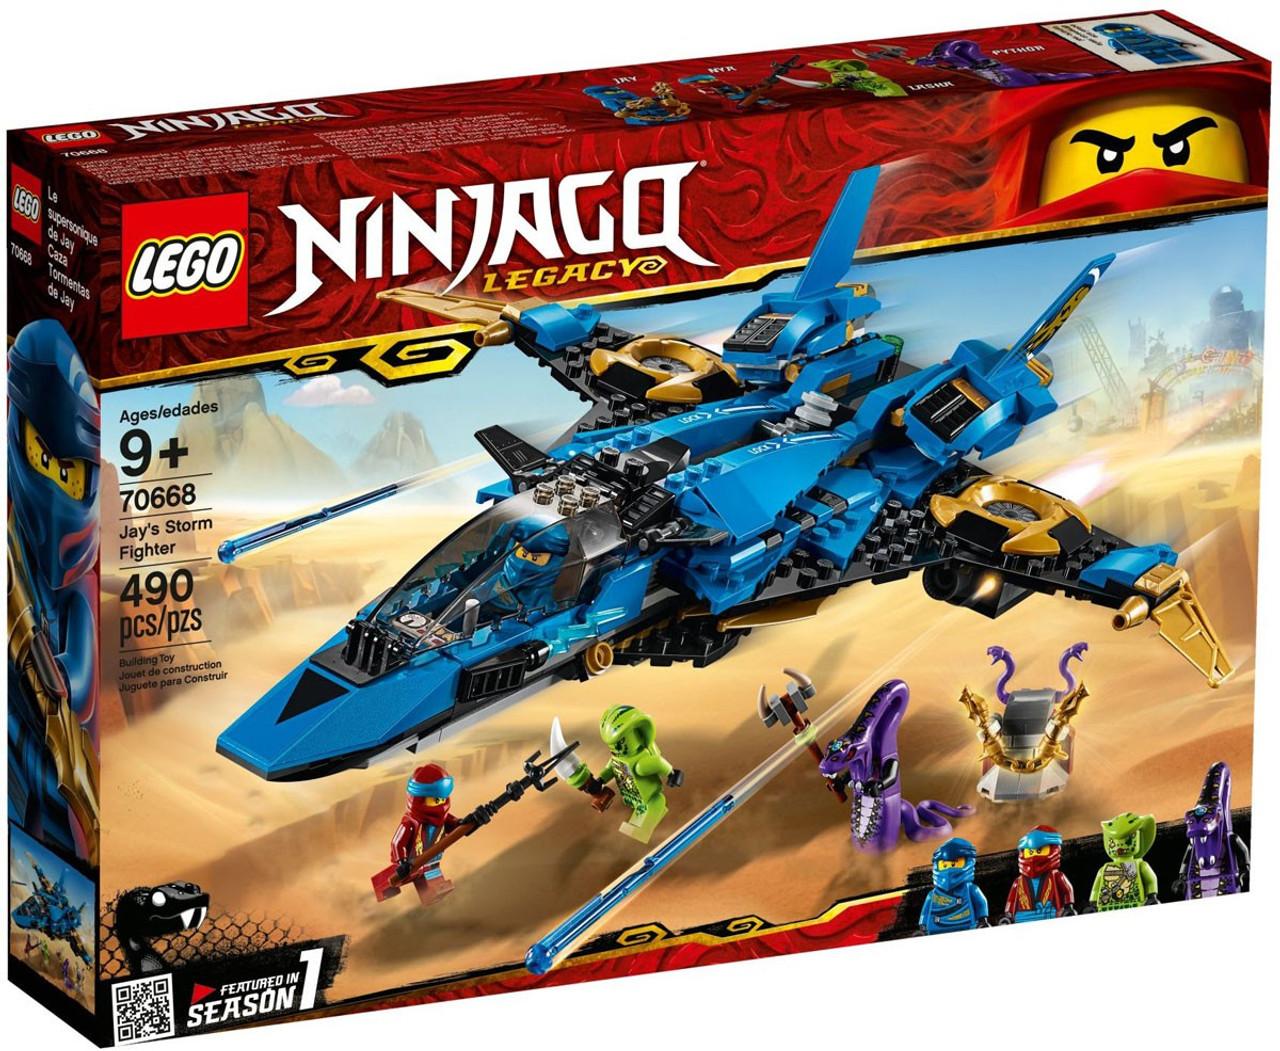 LEGO Ninjago Legacy Jays Storm Fighter Set 70668 - ToyWiz